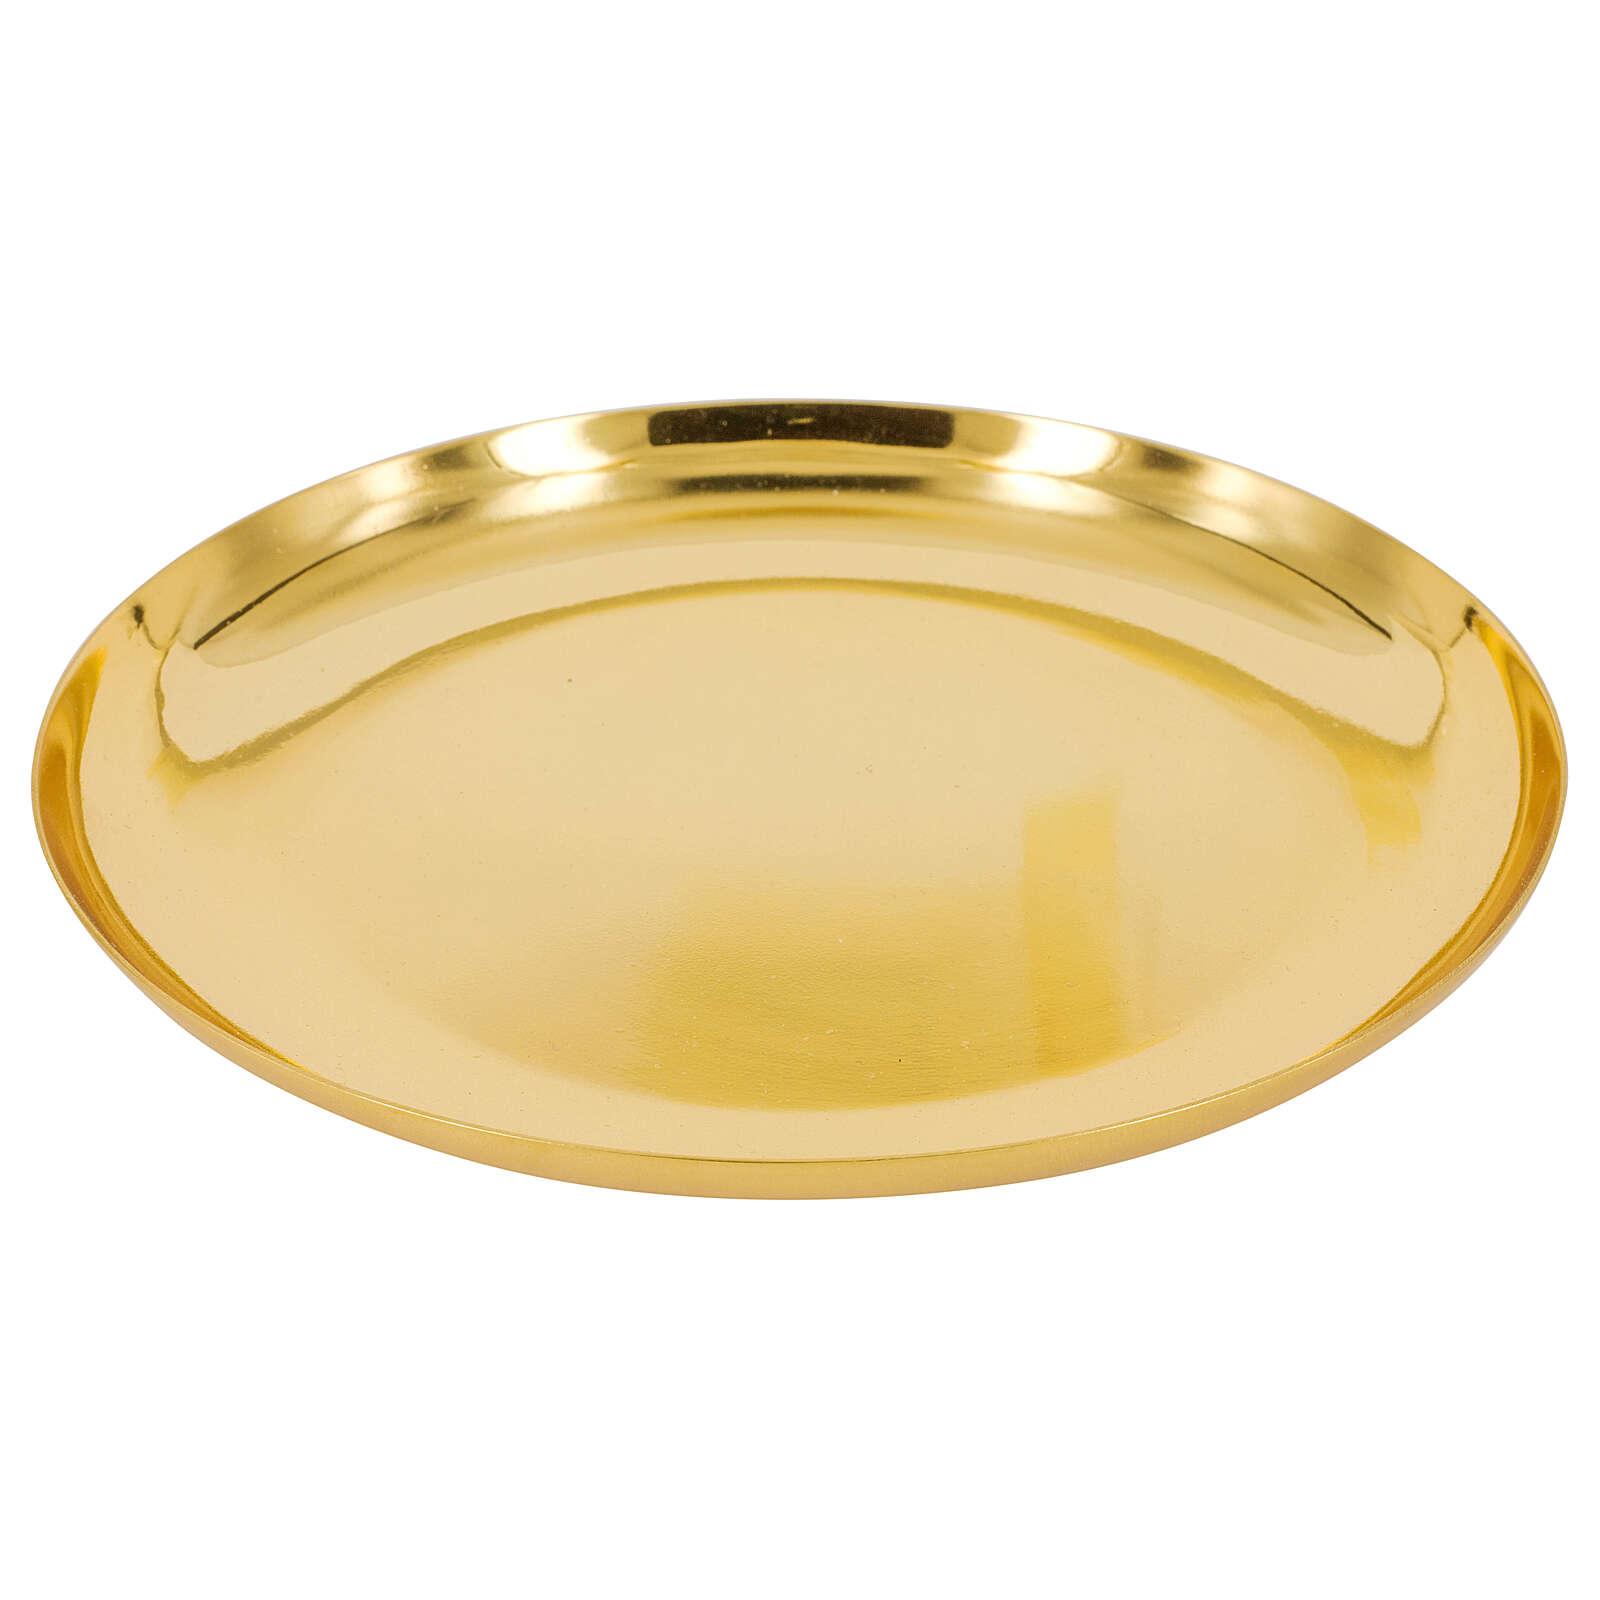 Patène dorée brillante laiton 4